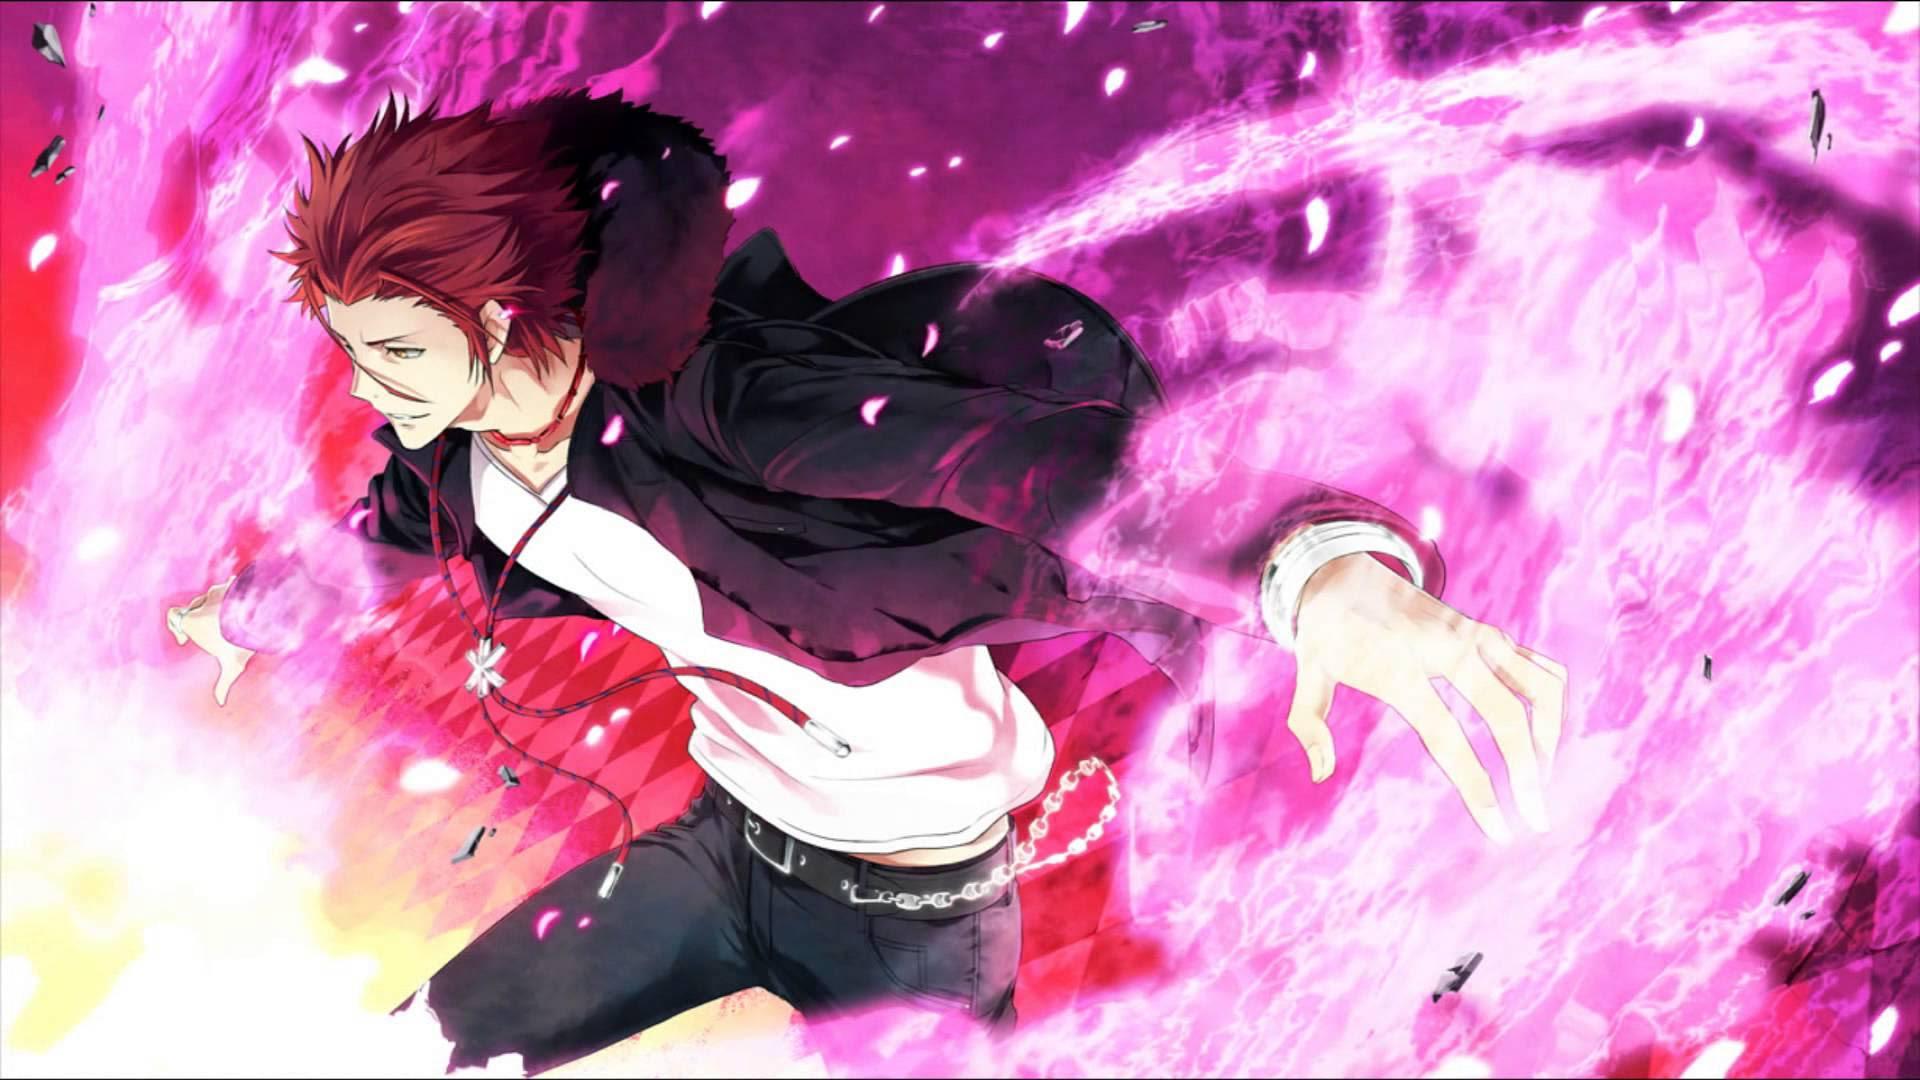 K Return Of Kings Anime Photo 39114729 Fanpop